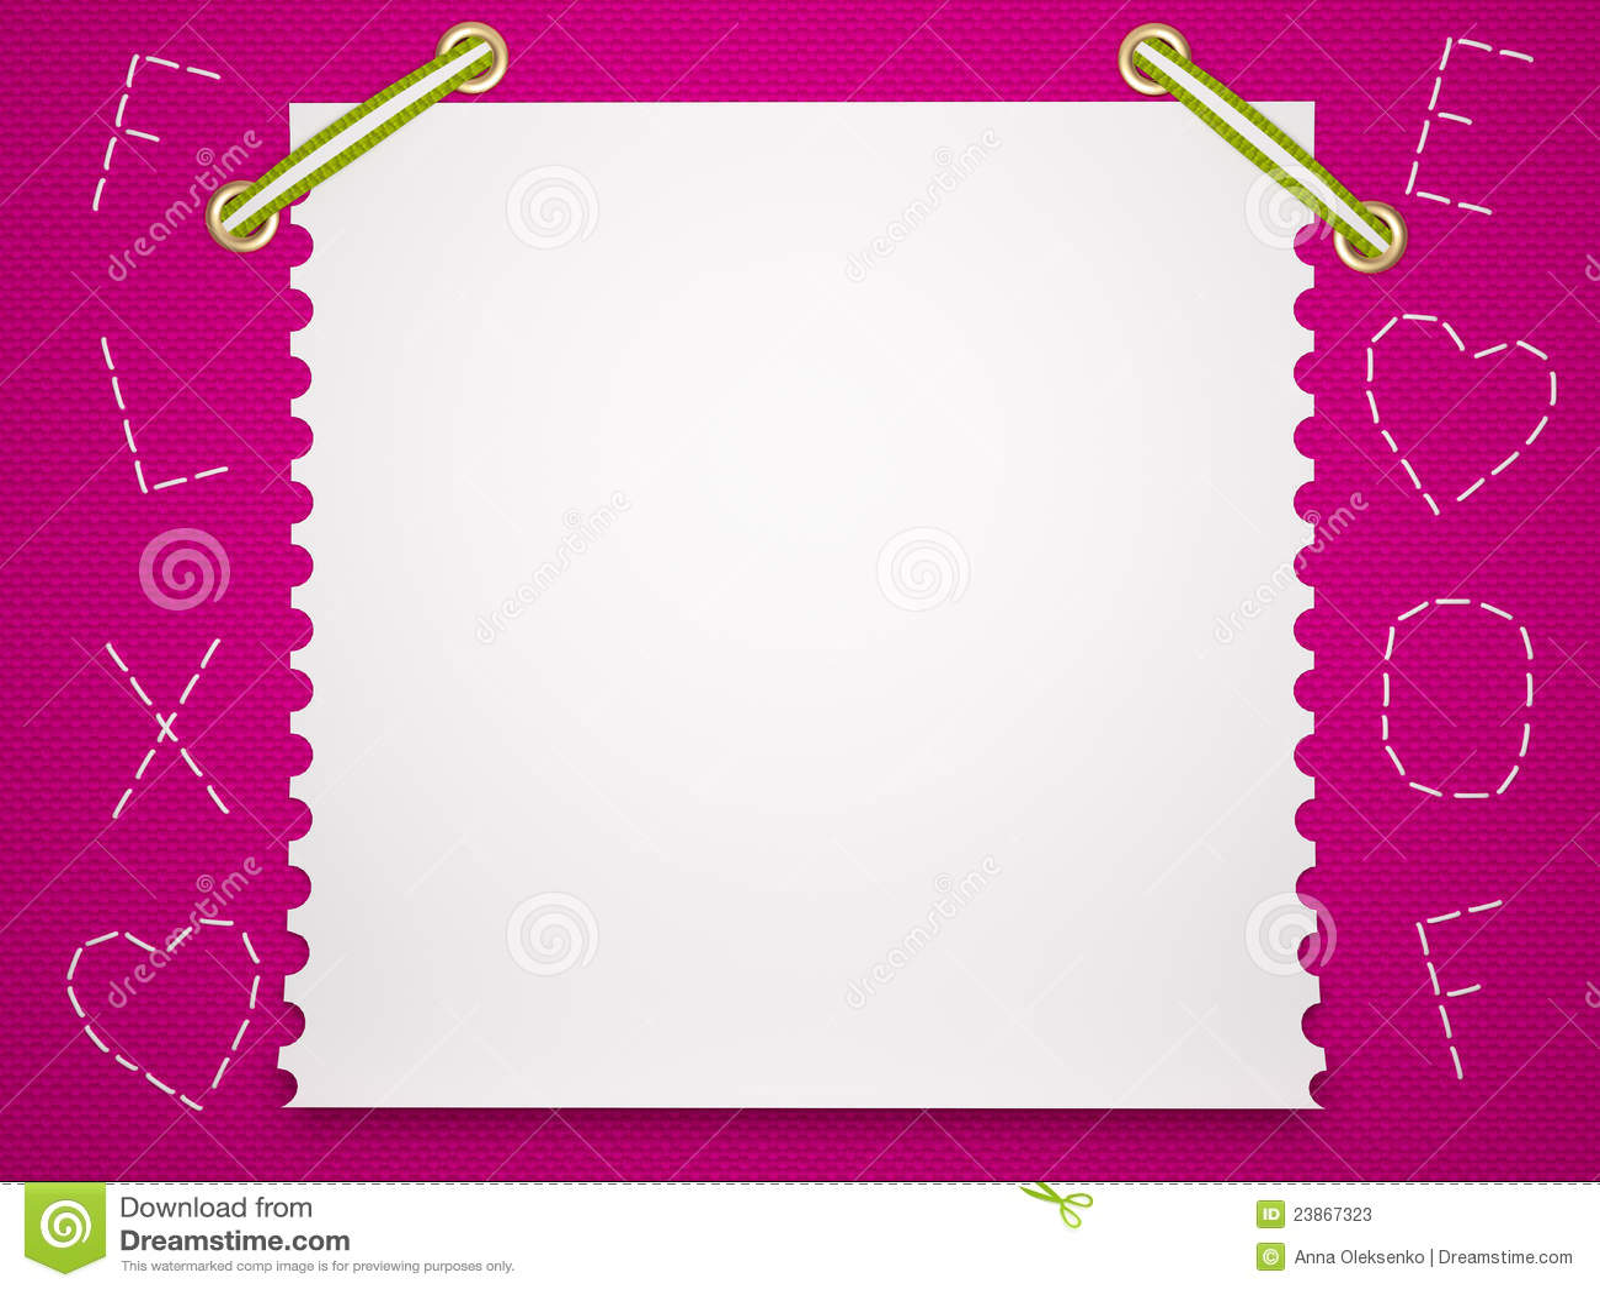 notebook paper background. children's background. stock illustration